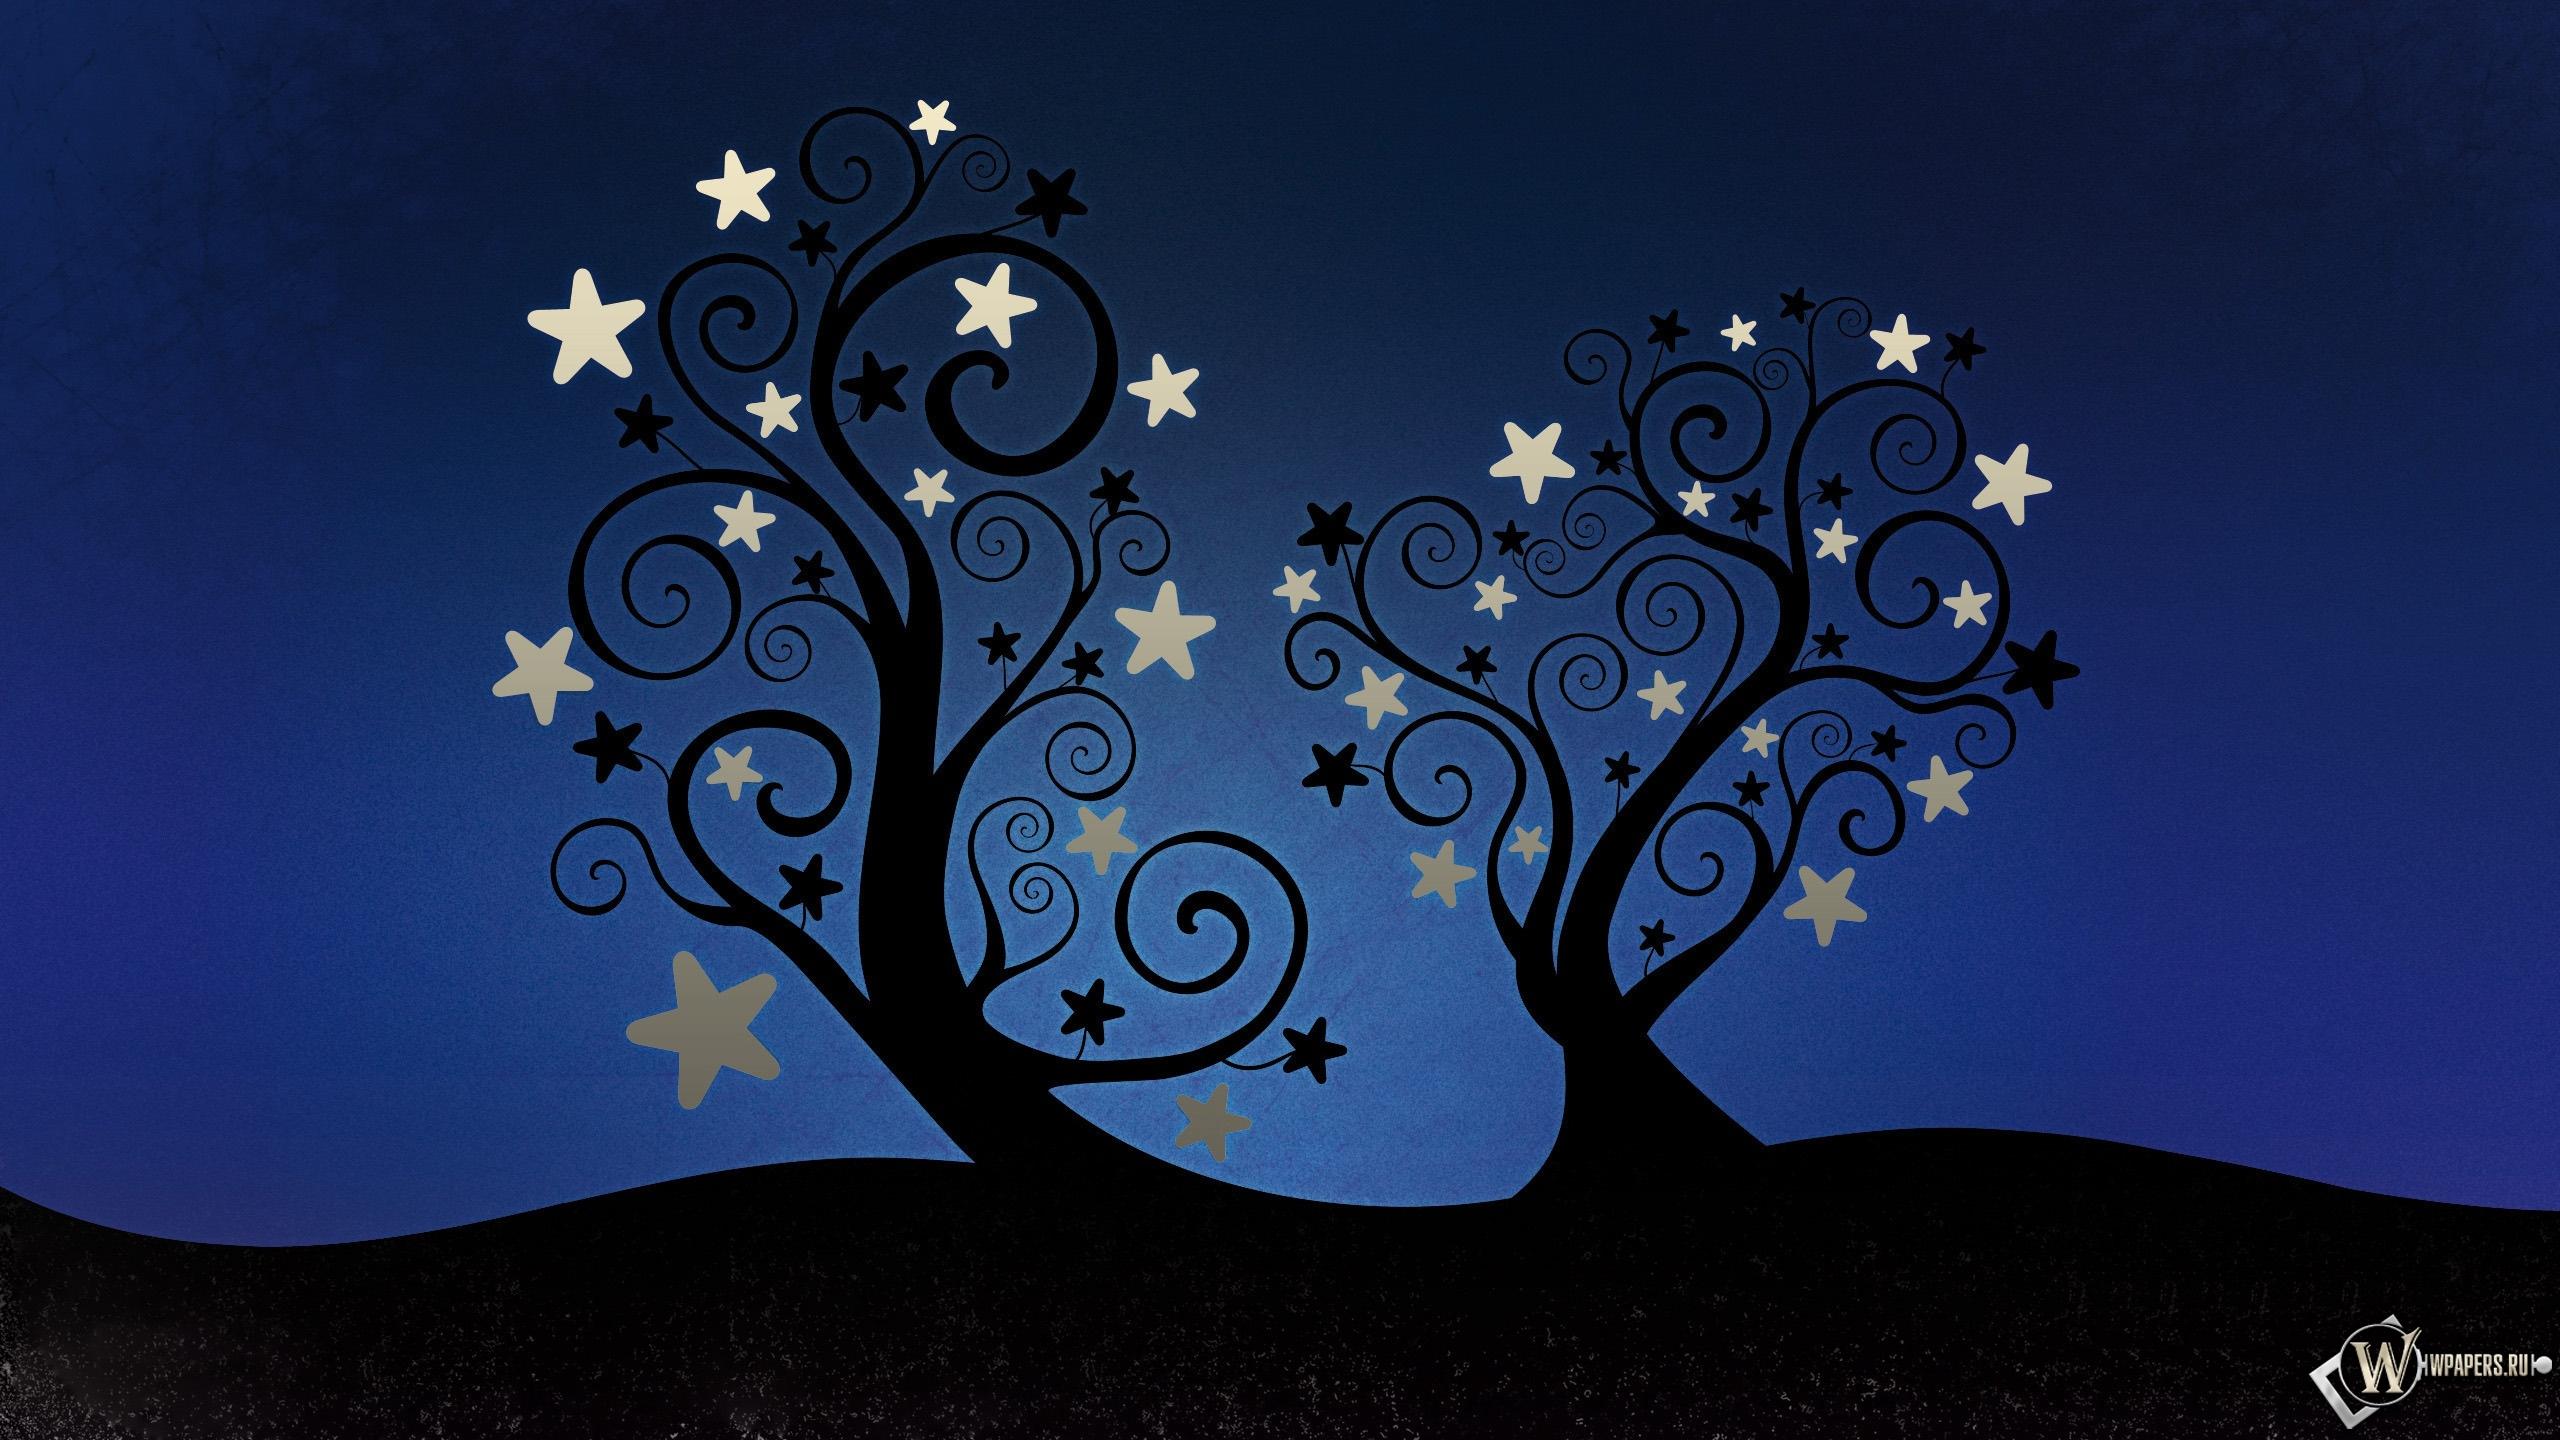 Деревья со звёздами 2560x1440